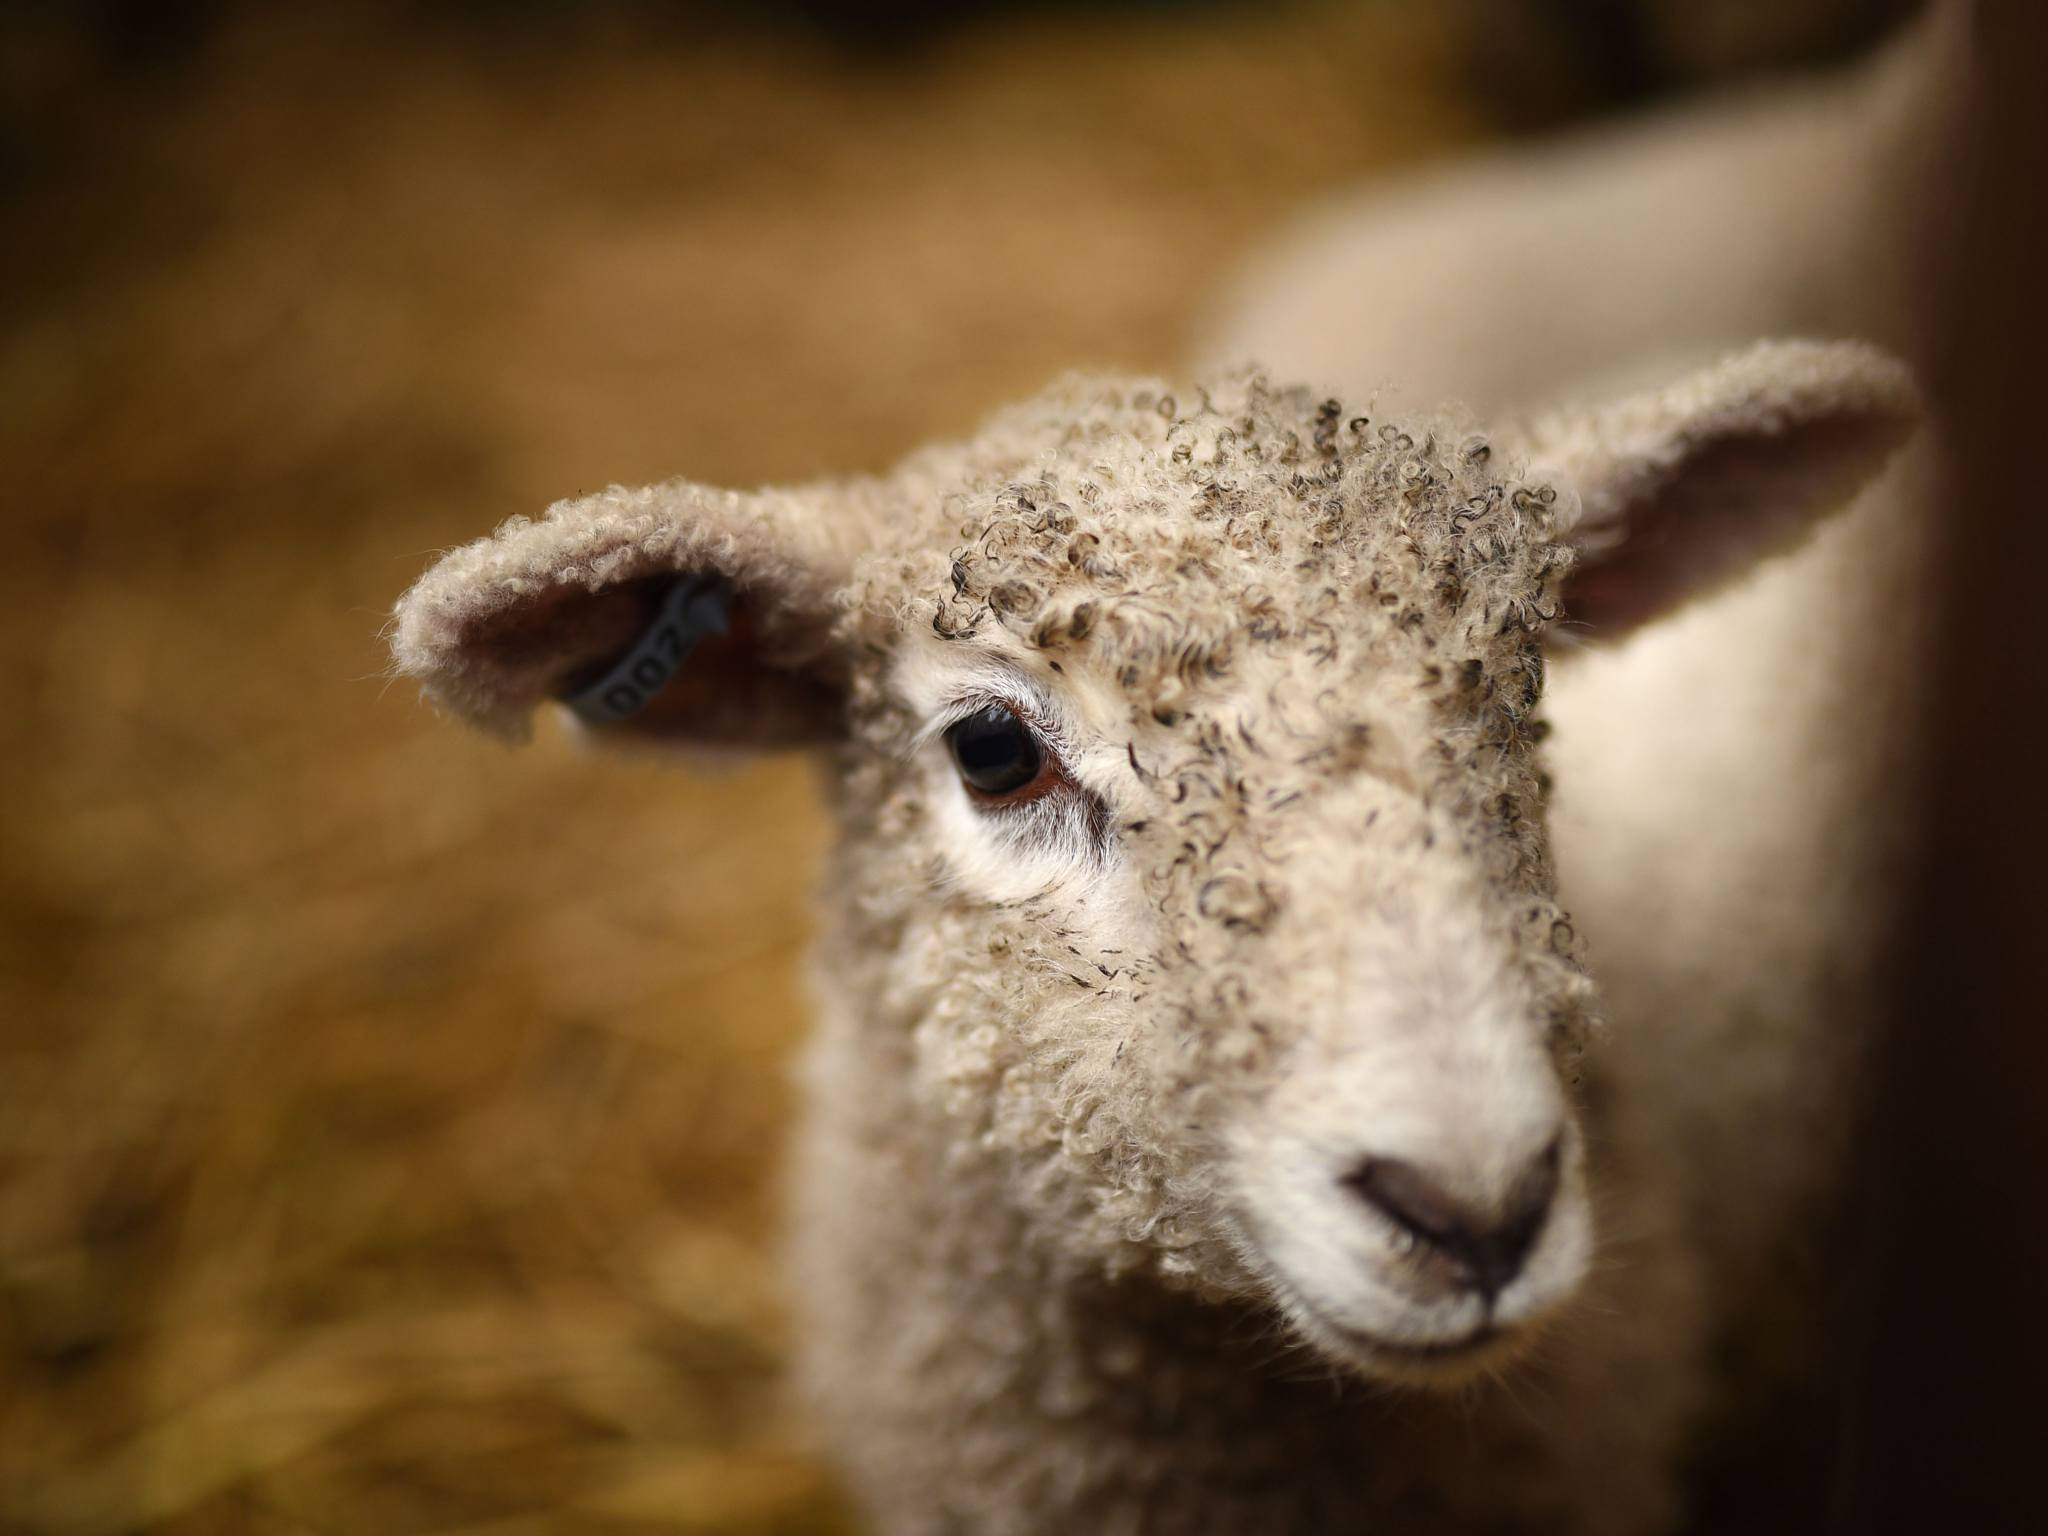 A lamb at the Collingwood Children's Farm